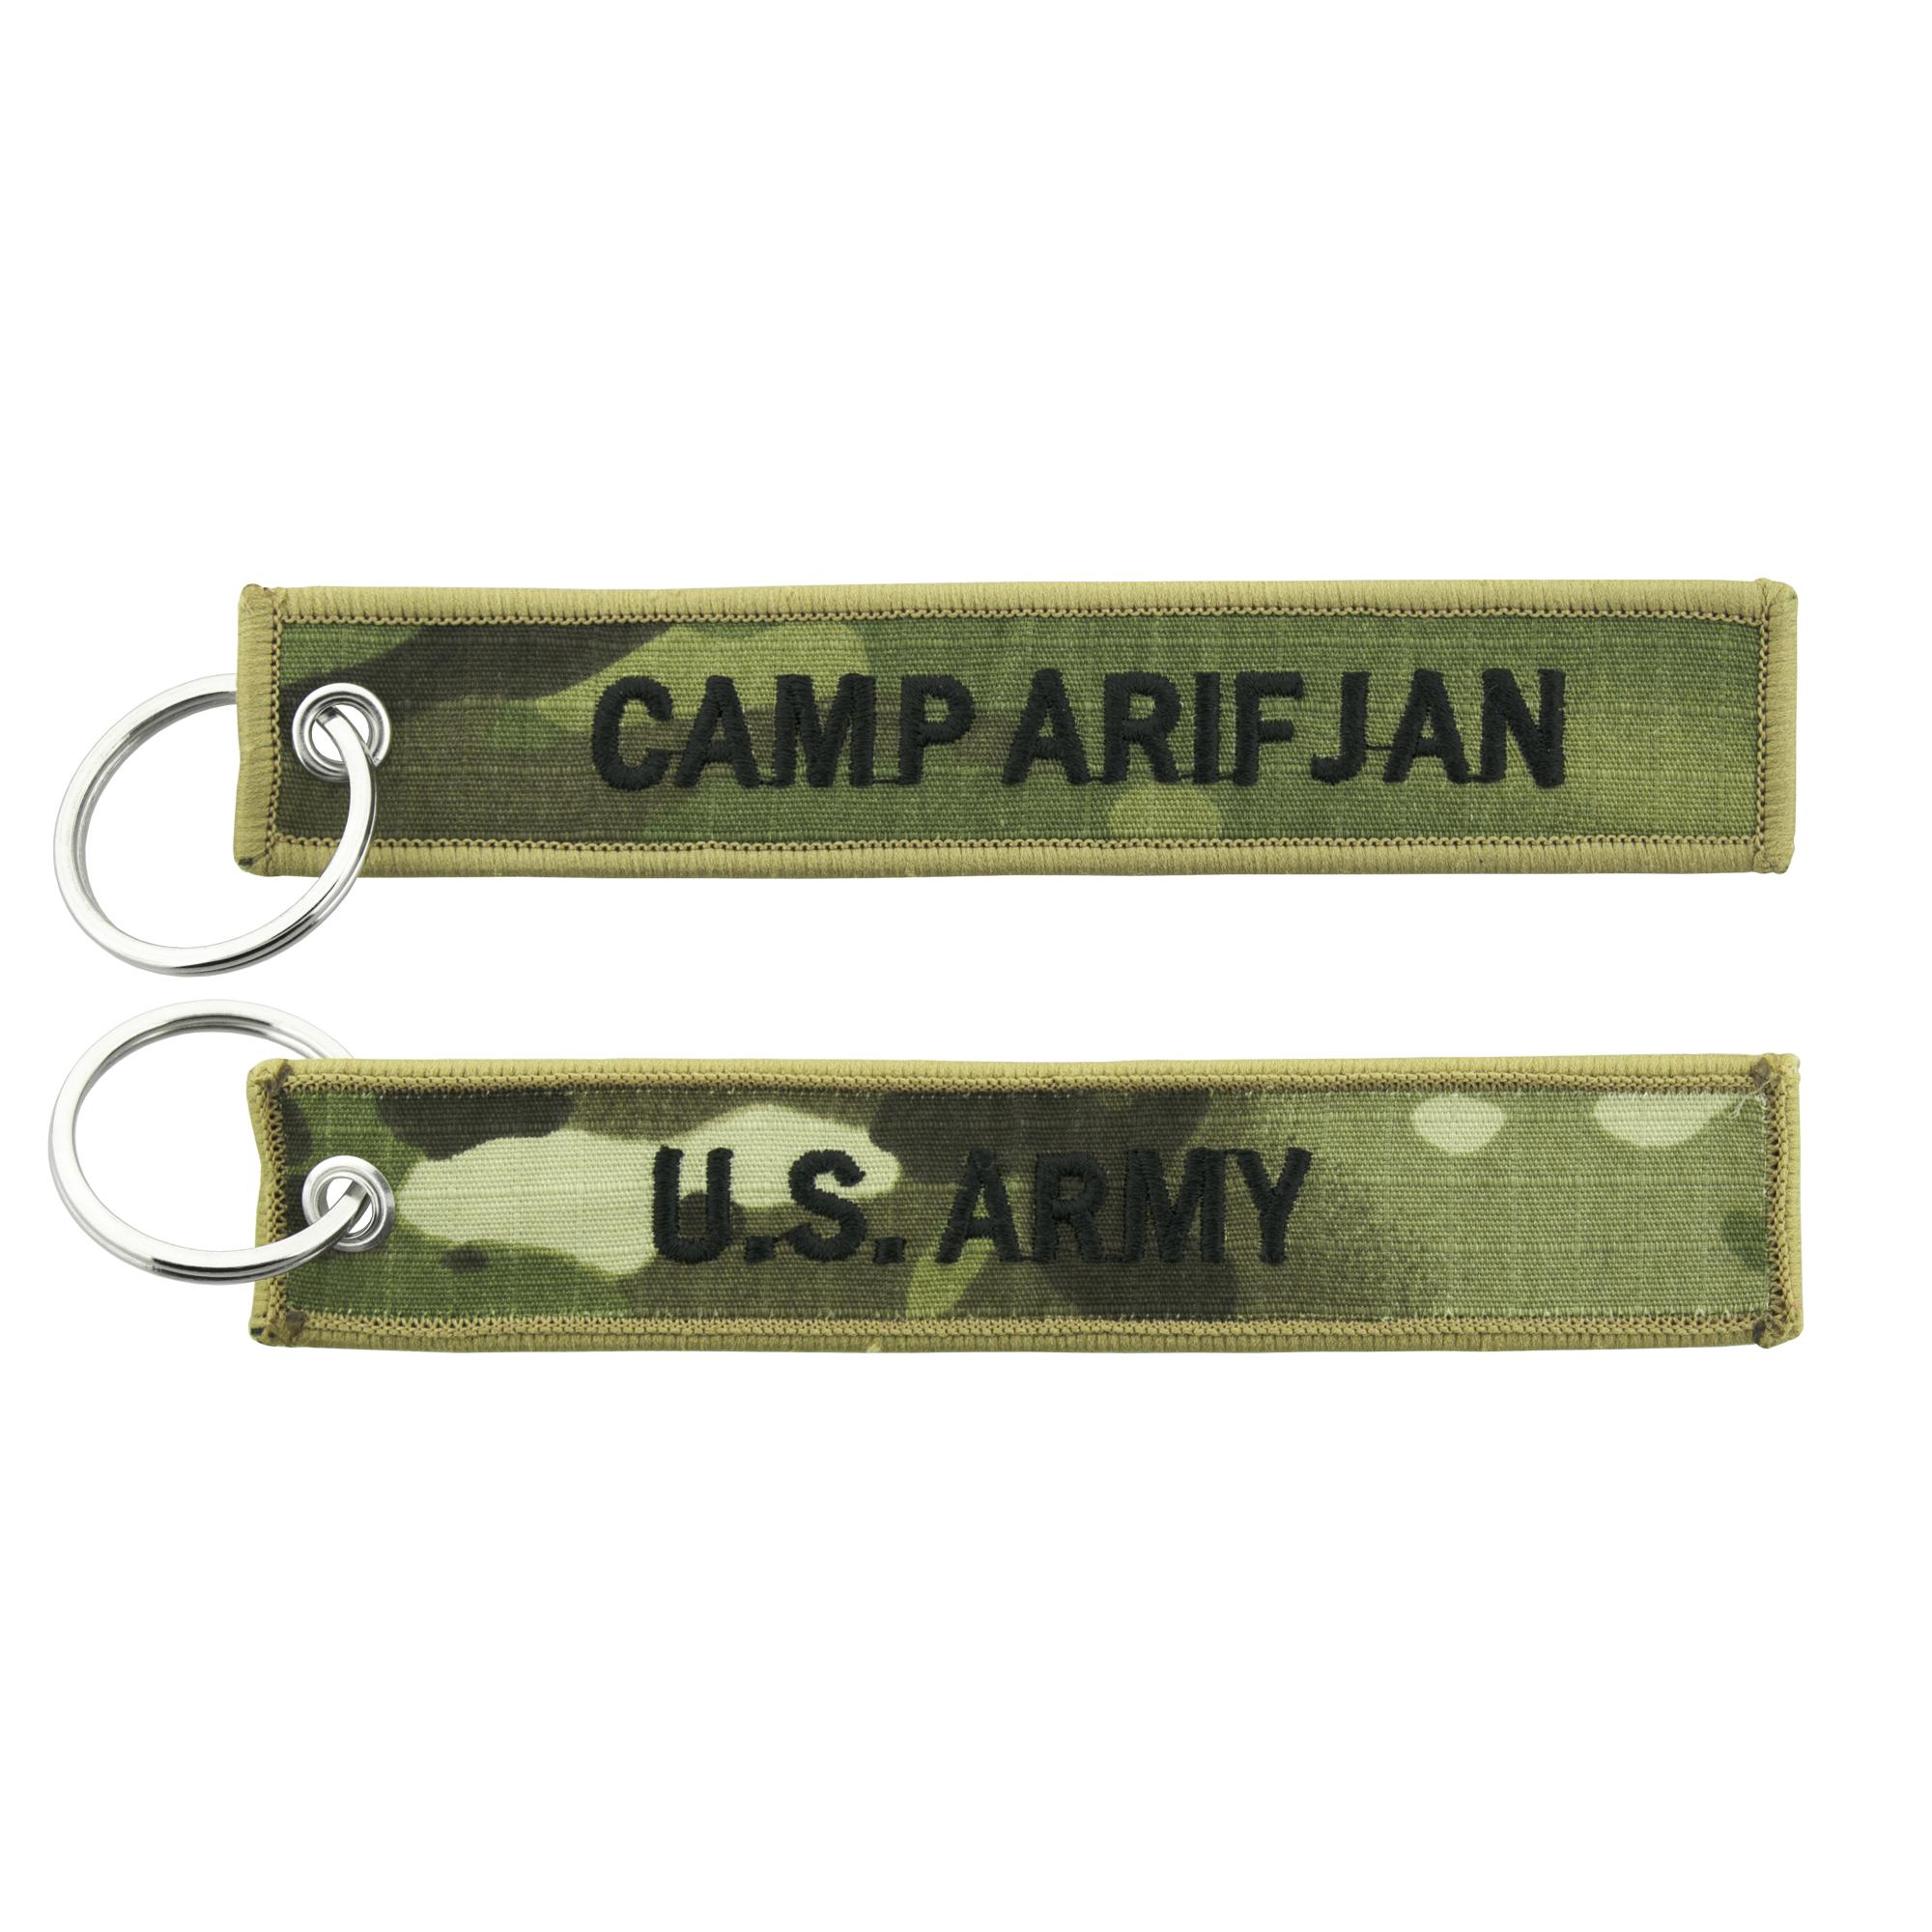 Camp arifjan zip code